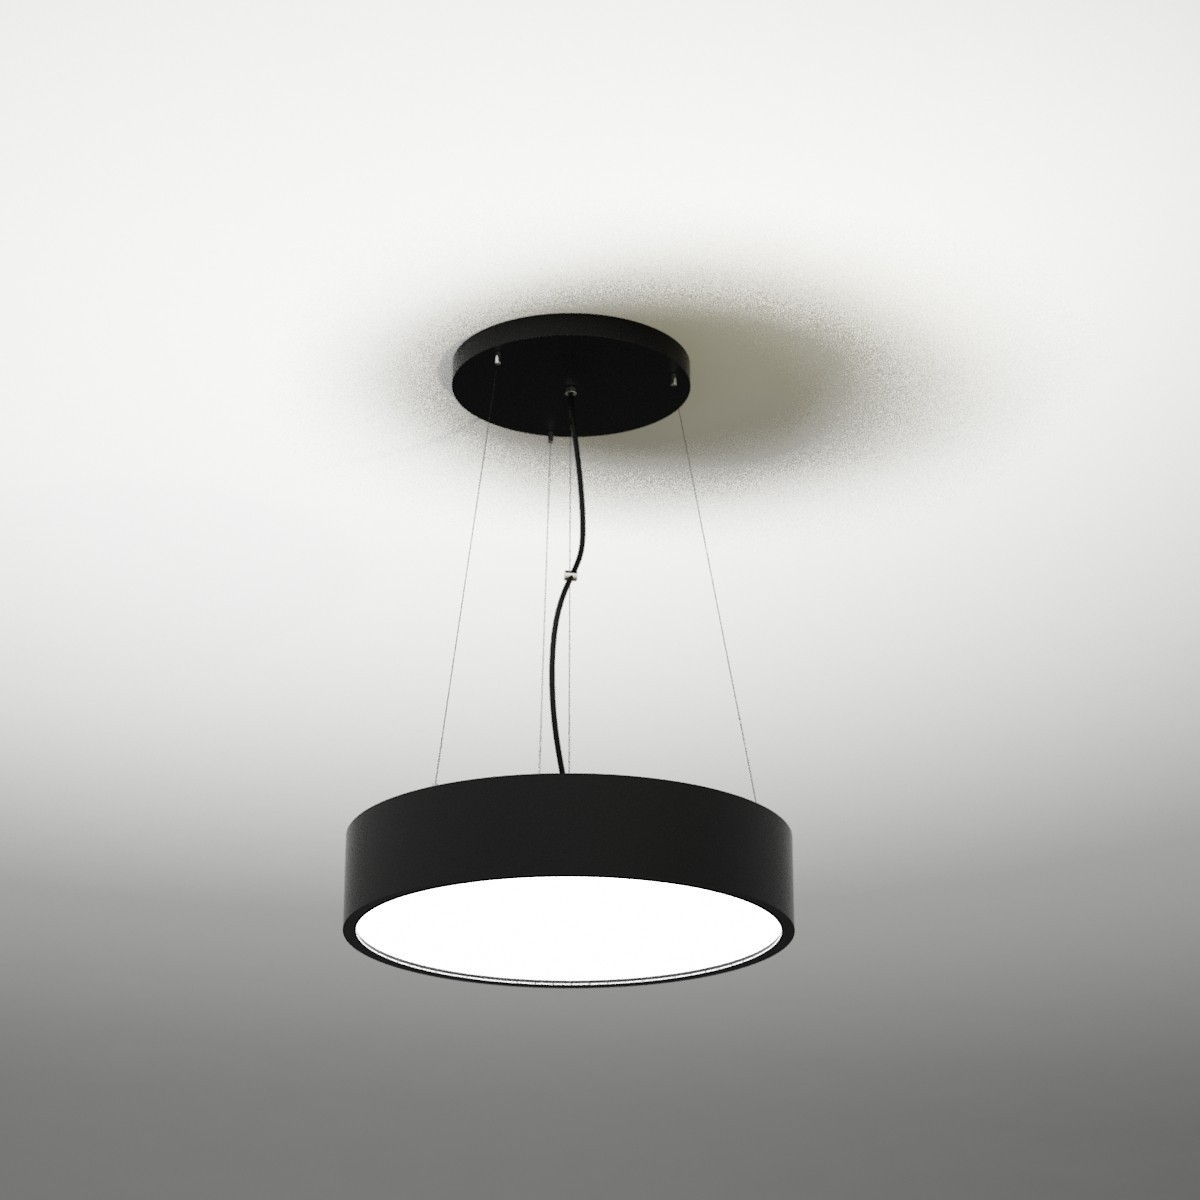 Shilo : Lampa wisząca BUNGO 516 5516-B/E27/Kolor